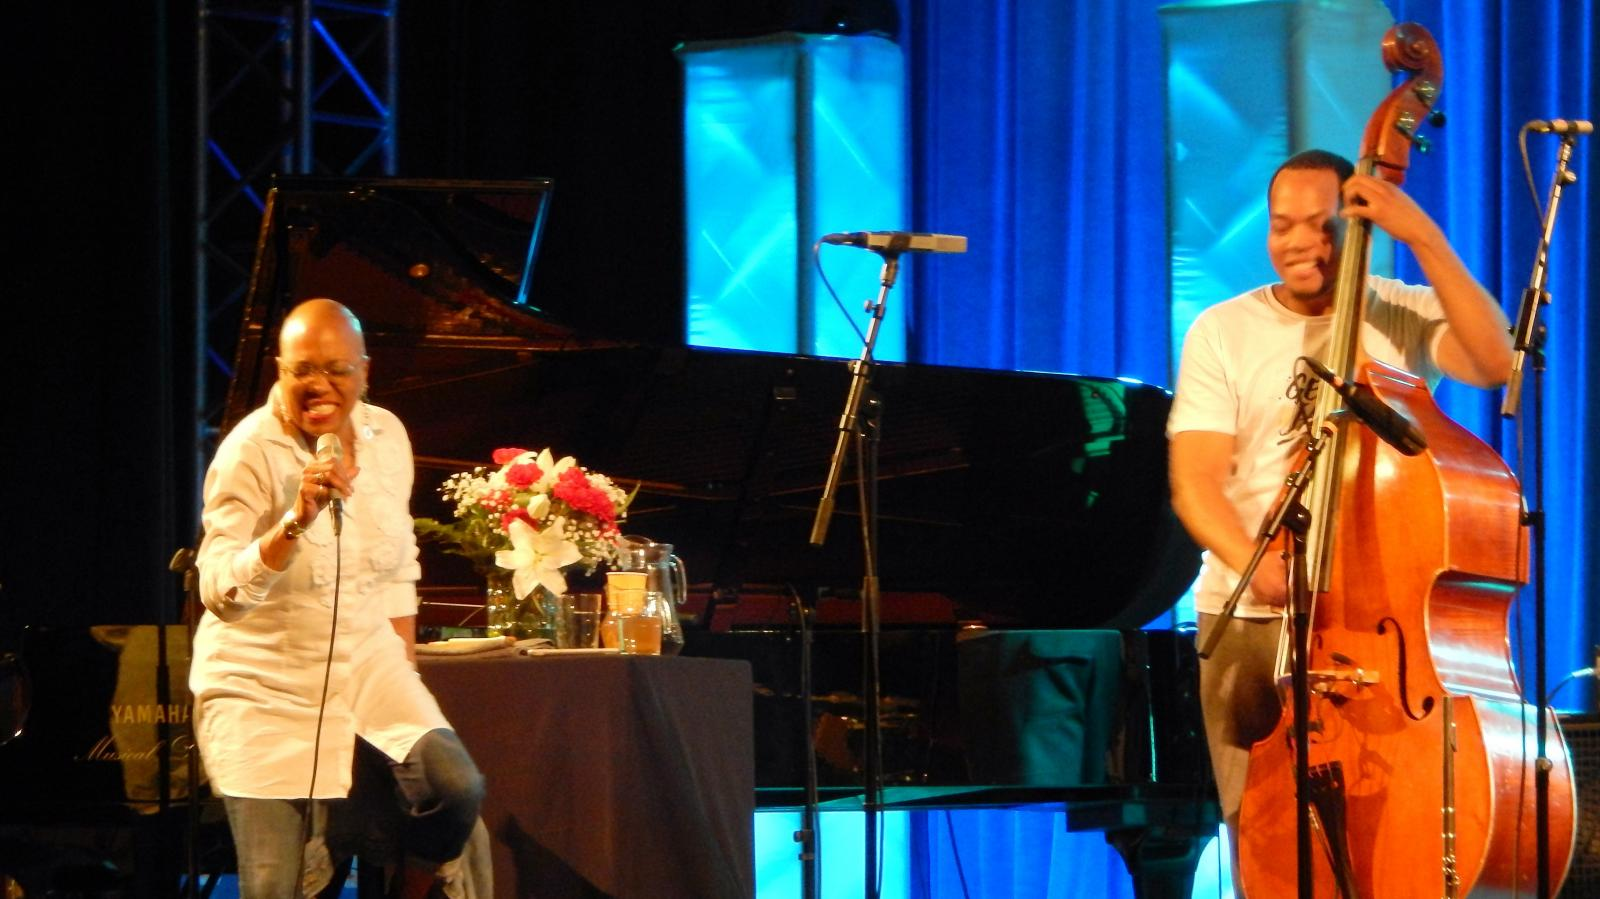 Dee Dee Bridgewater and Eric Wheeler at Getxo Jazz 2016